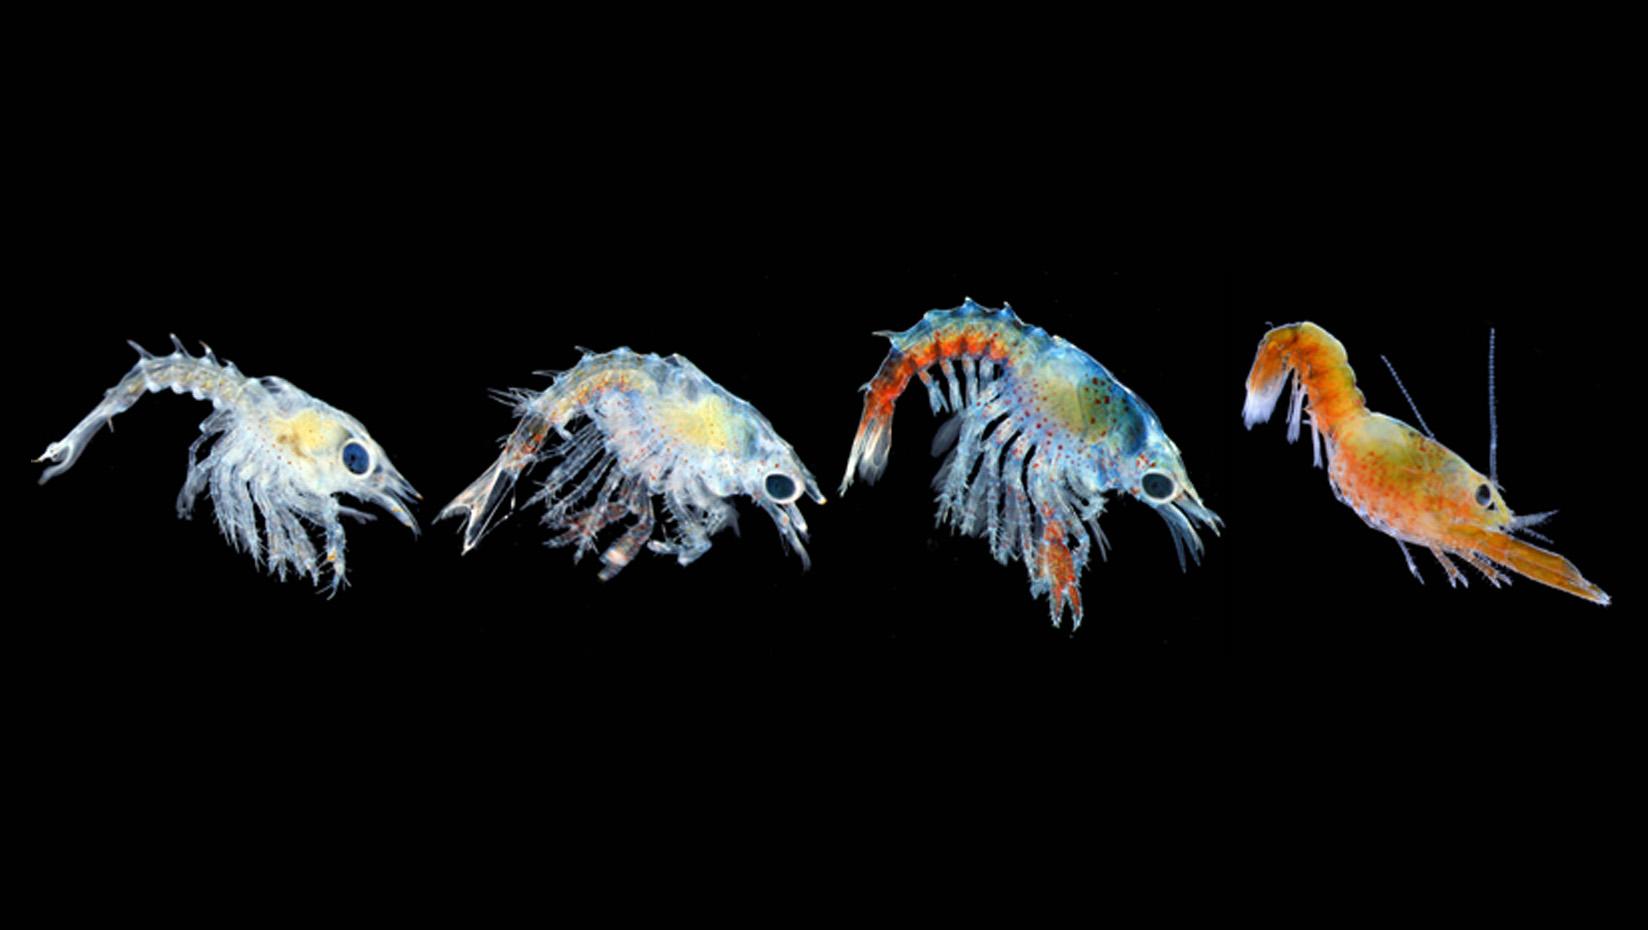 DMC, Bigelow study: Rising ocean temperatures threaten baby lobsters - UMaine News - University ...